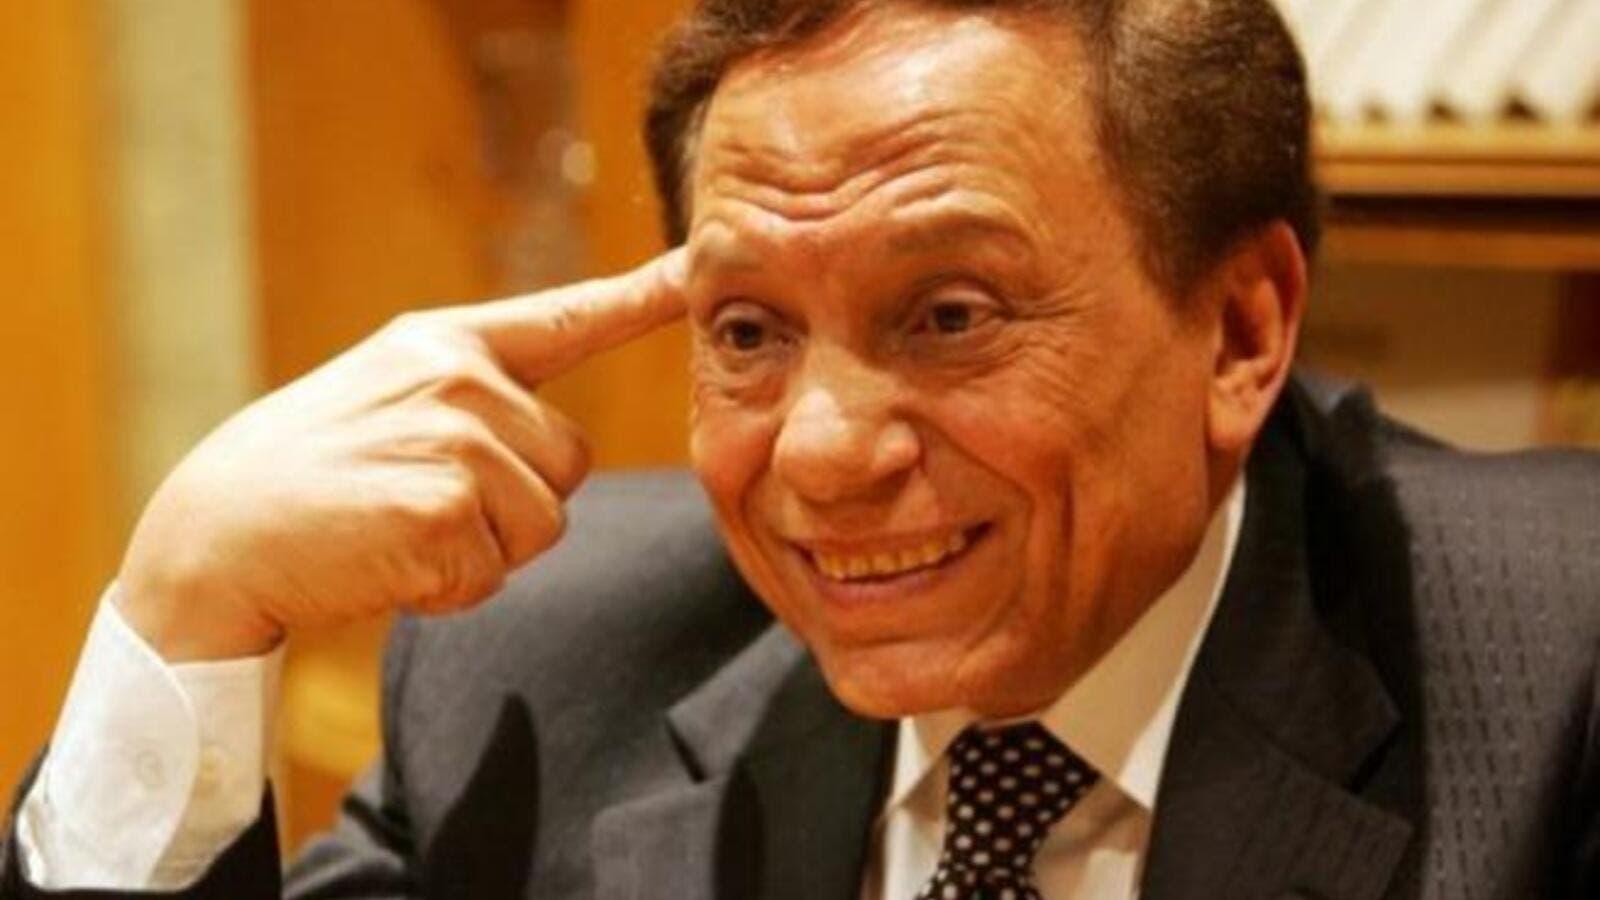 ADEL IMAM FILM EGYPTIEN TÉLÉCHARGER